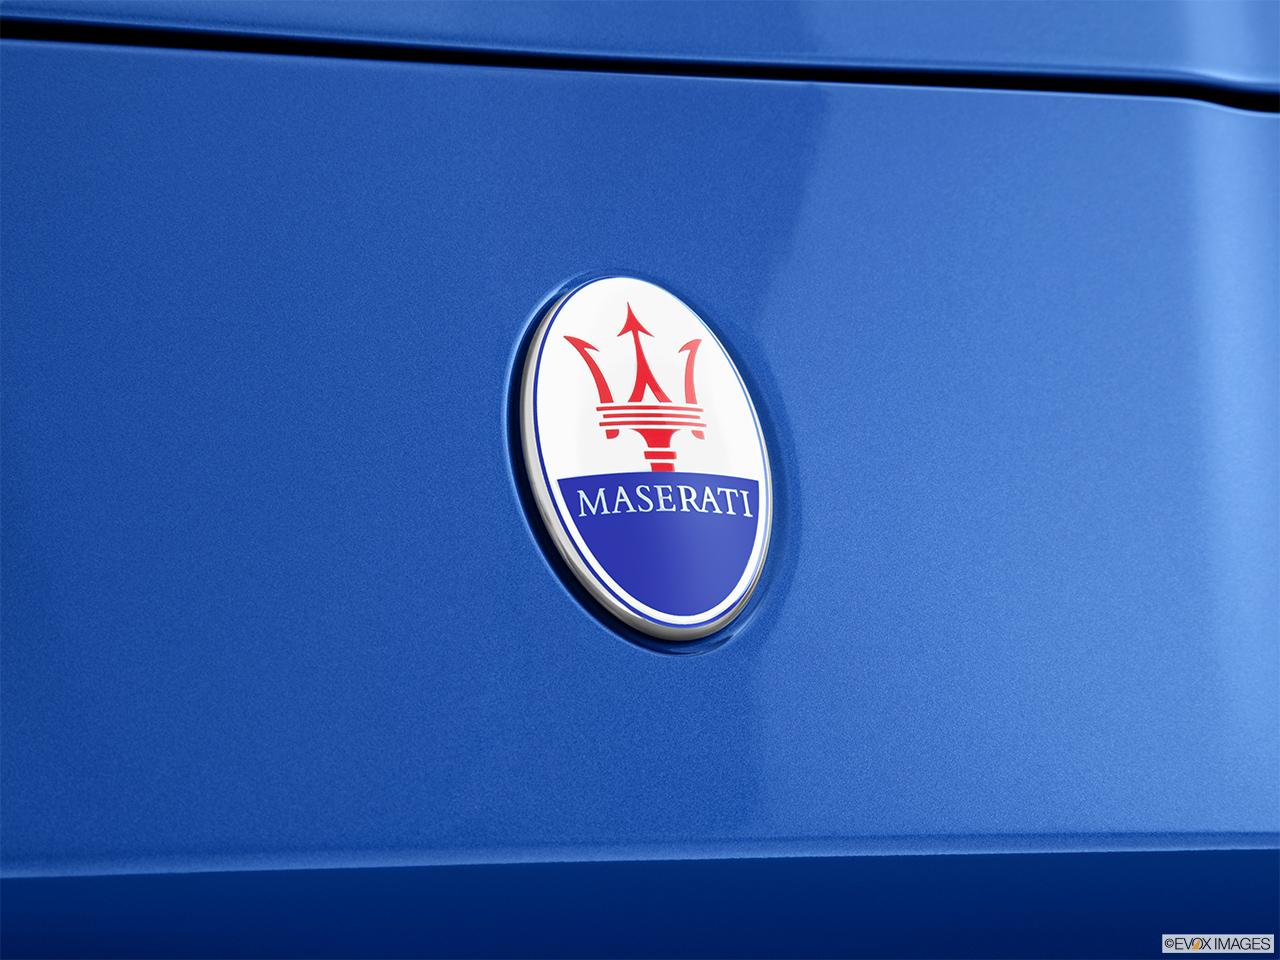 Maserati >> 2015 Maserati GranTurismo GranTurismo MC Centennial Coupe - Rear manufacture badge/emblem